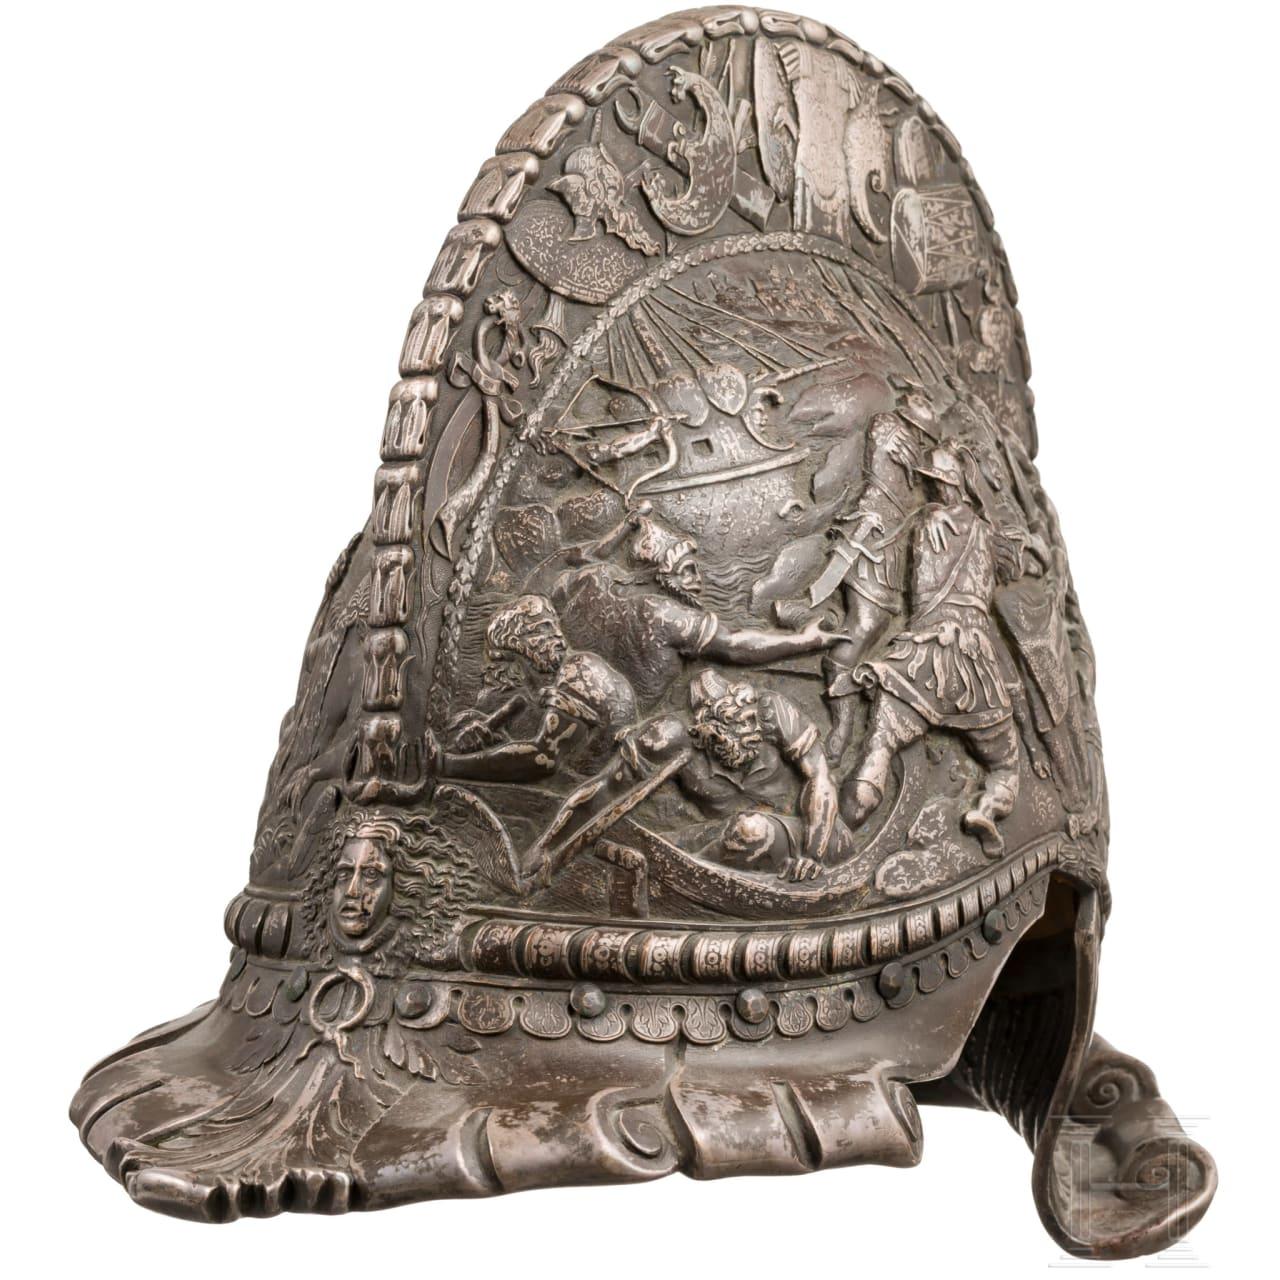 A splendid German historicism burgonet in copper die casting, modelled after the Renaissance, circa 1860